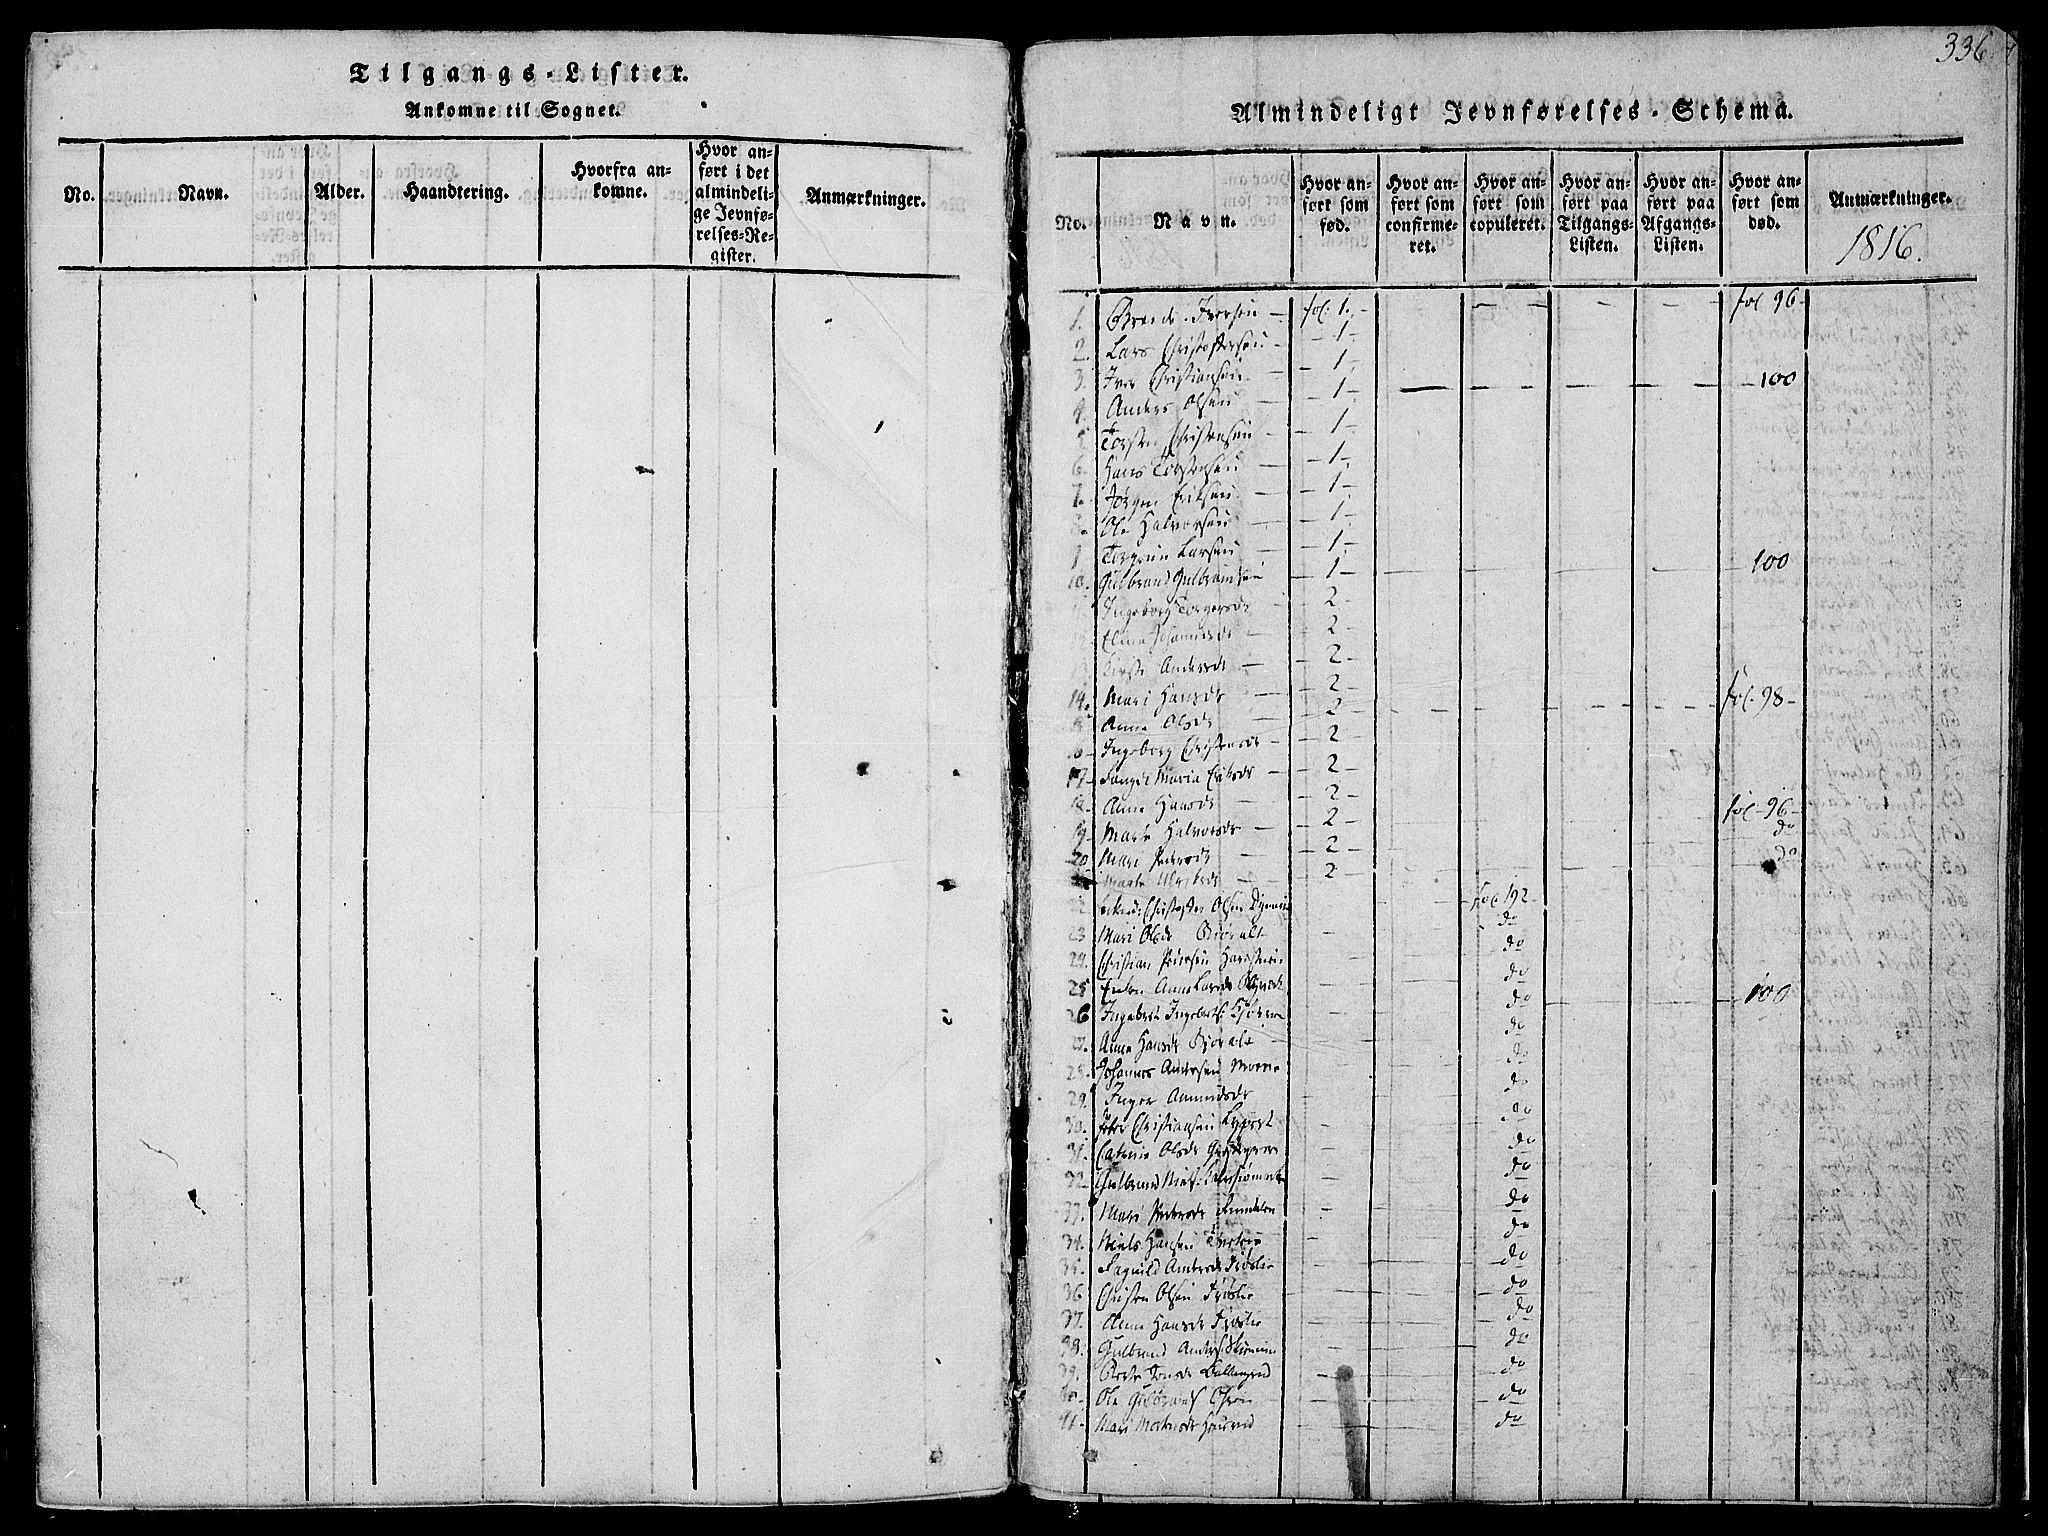 SAH, Jevnaker prestekontor, Ministerialbok nr. 5, 1815-1837, s. 336